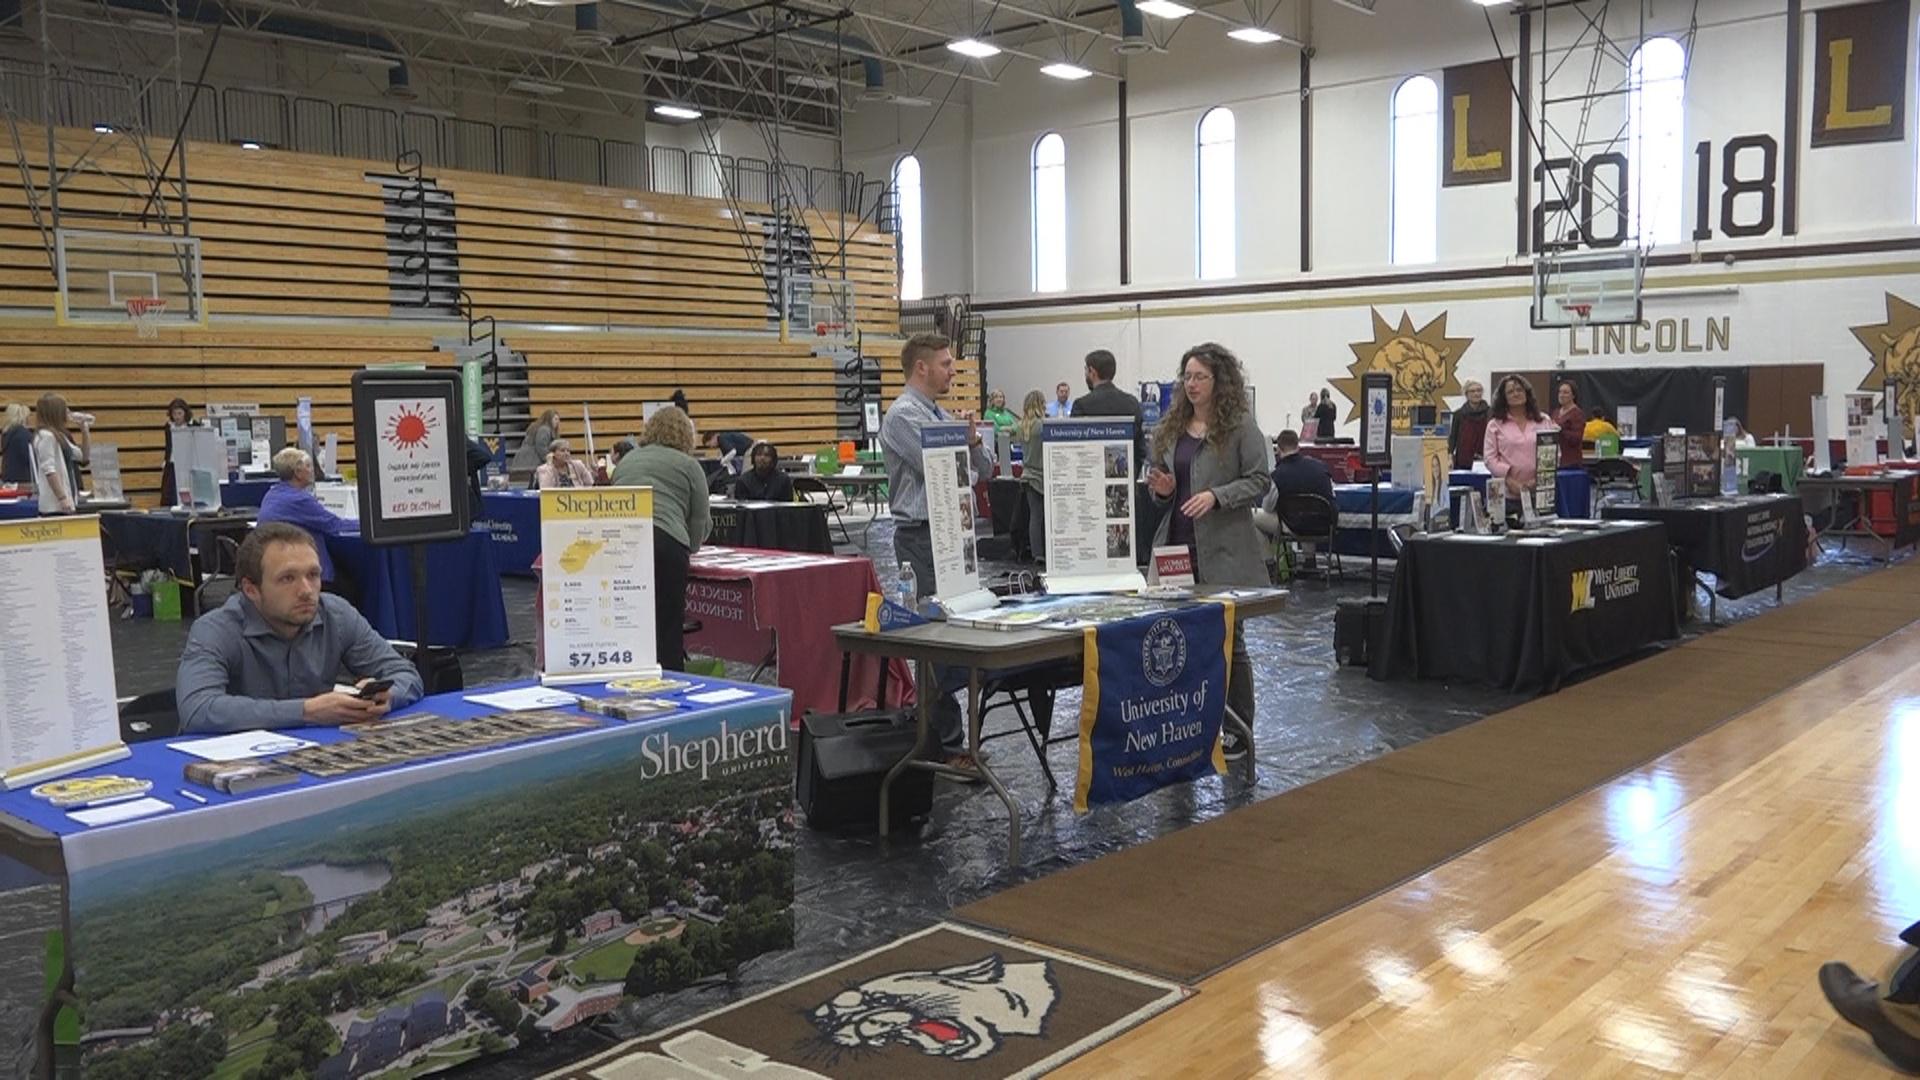 Harrison County college and career fair_1540431024324.jpg.jpg